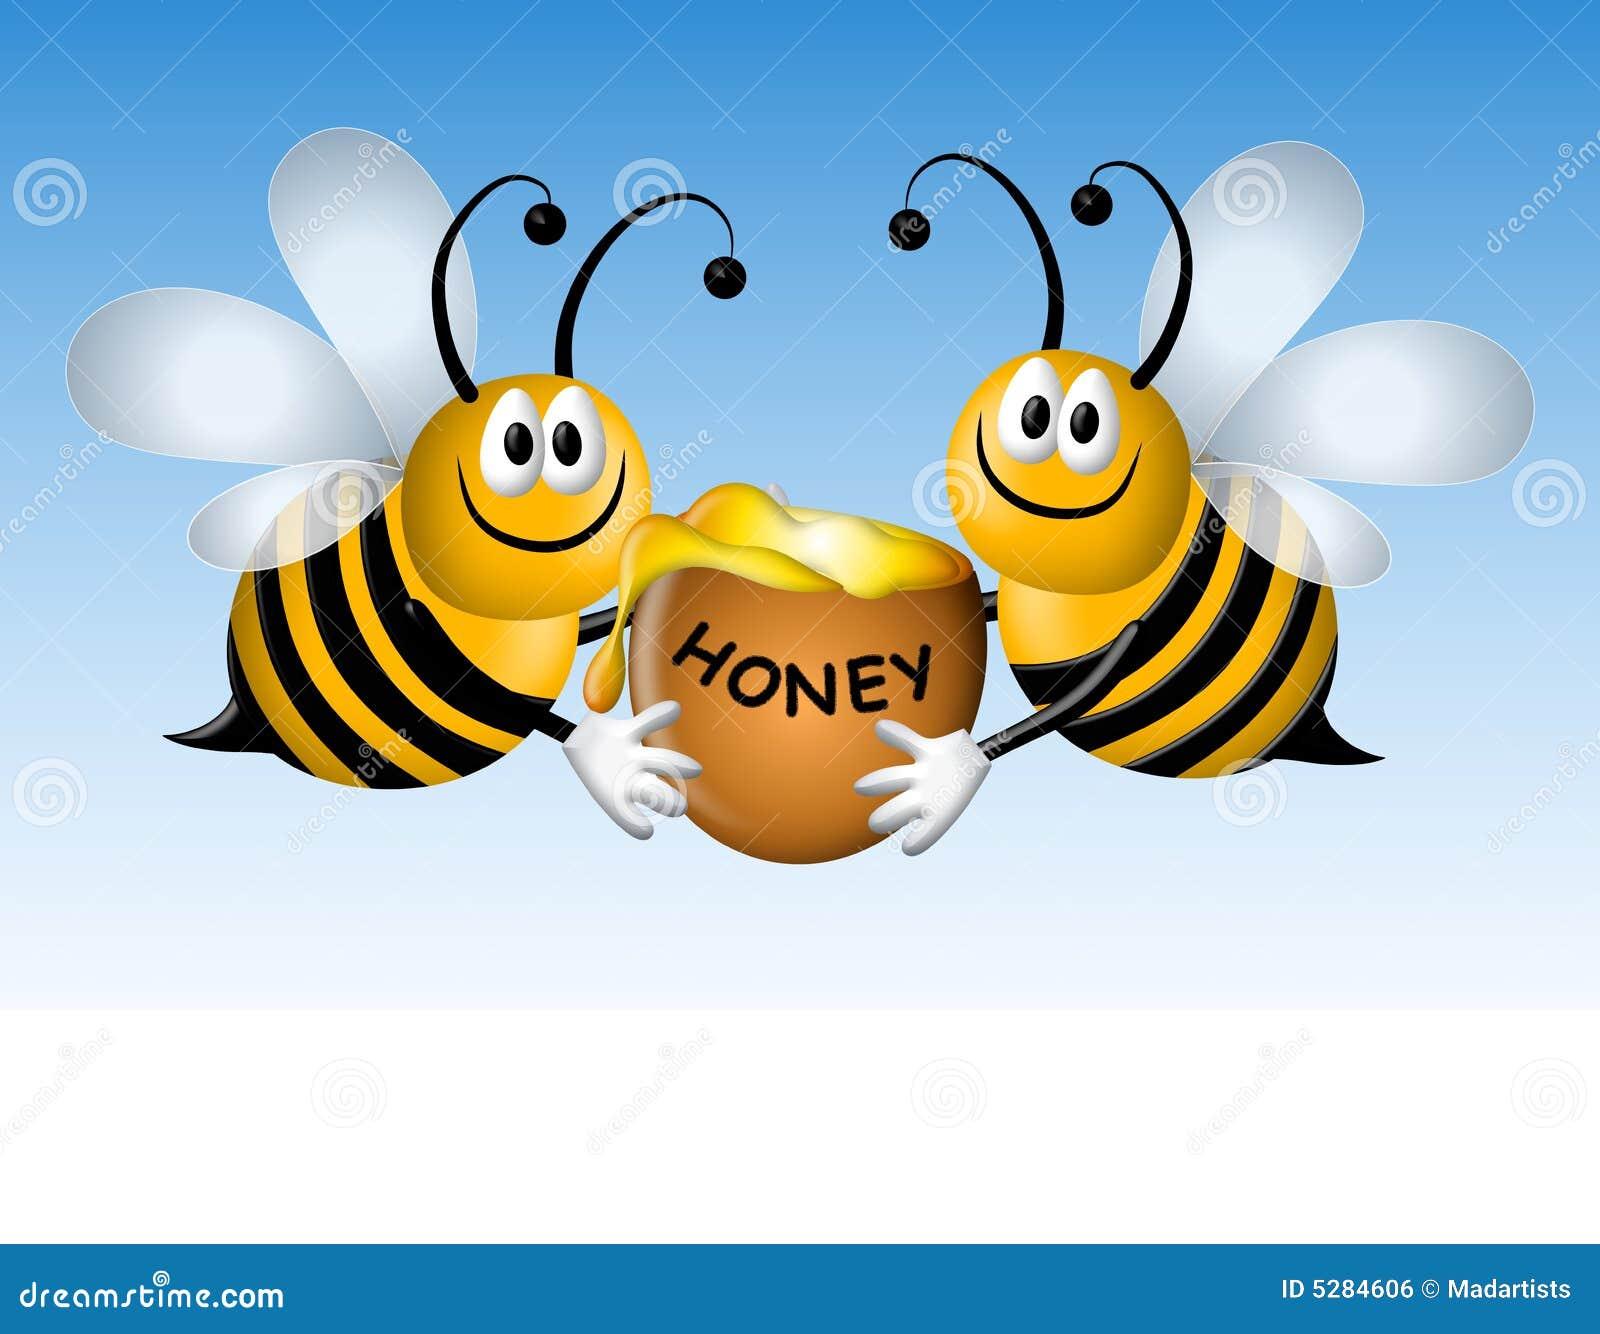 Cool Honey Bees Cartoo...